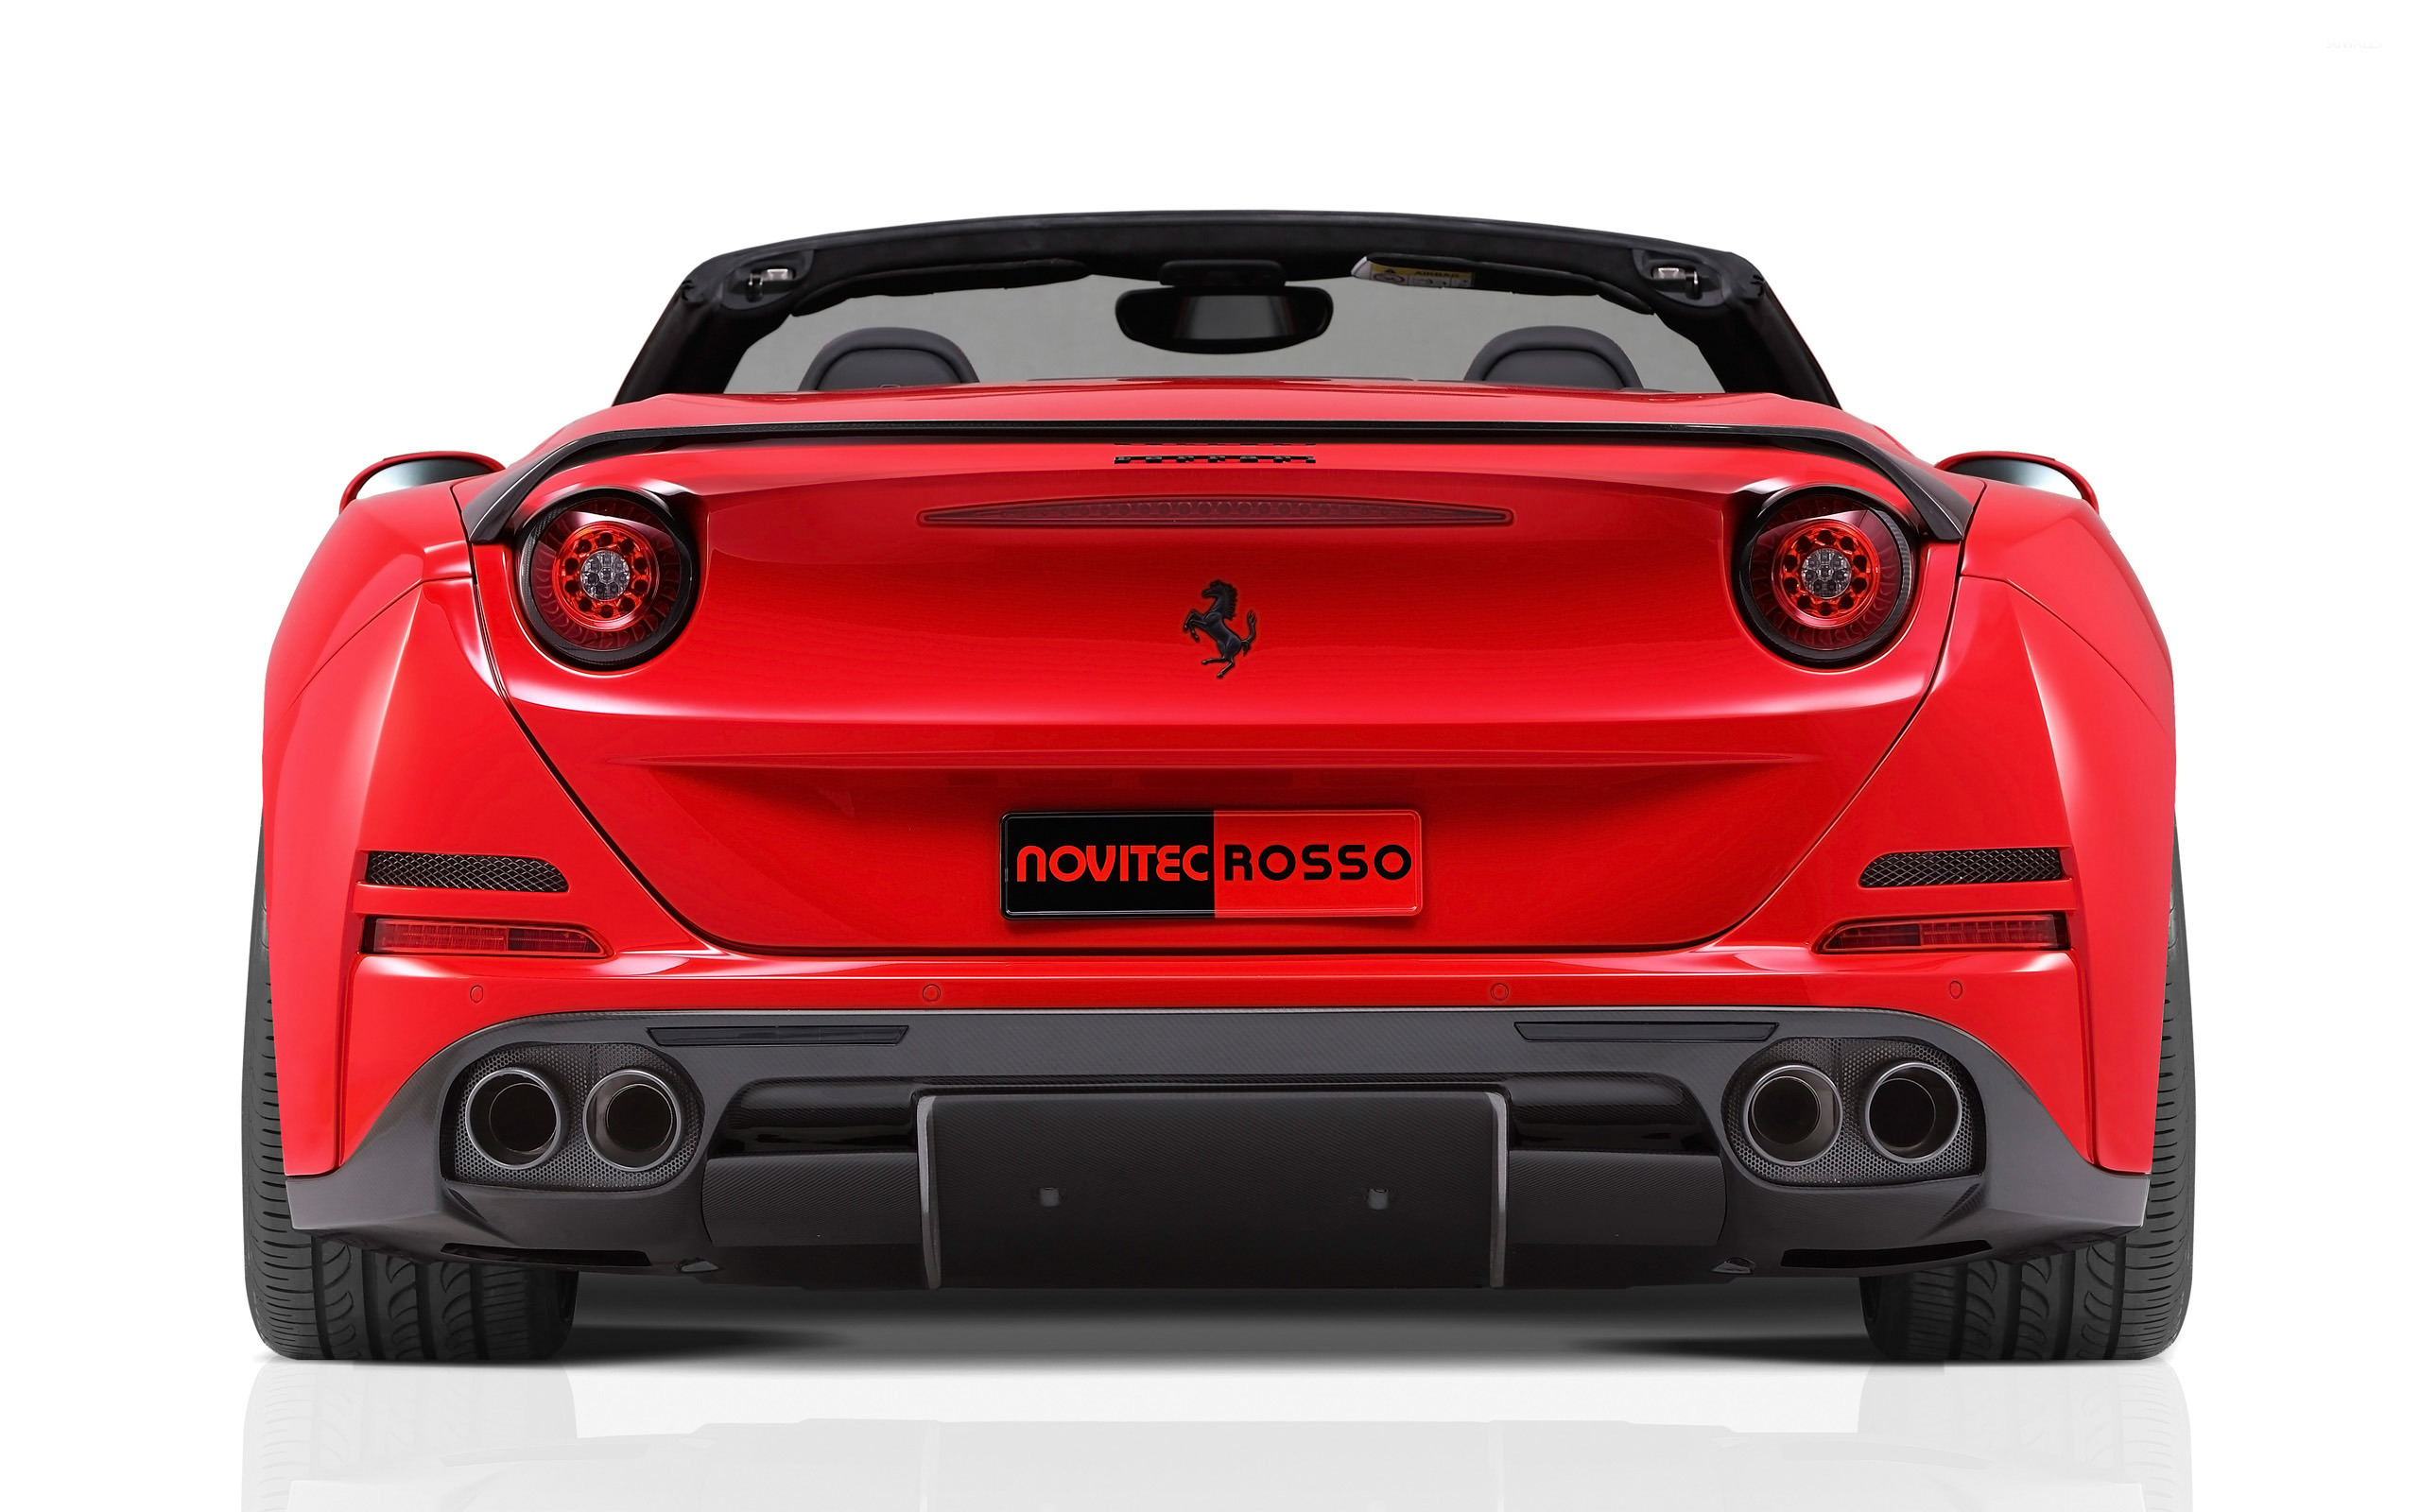 2015 Novitec Rosso Ferrari California Back View Close Up Wallpaper